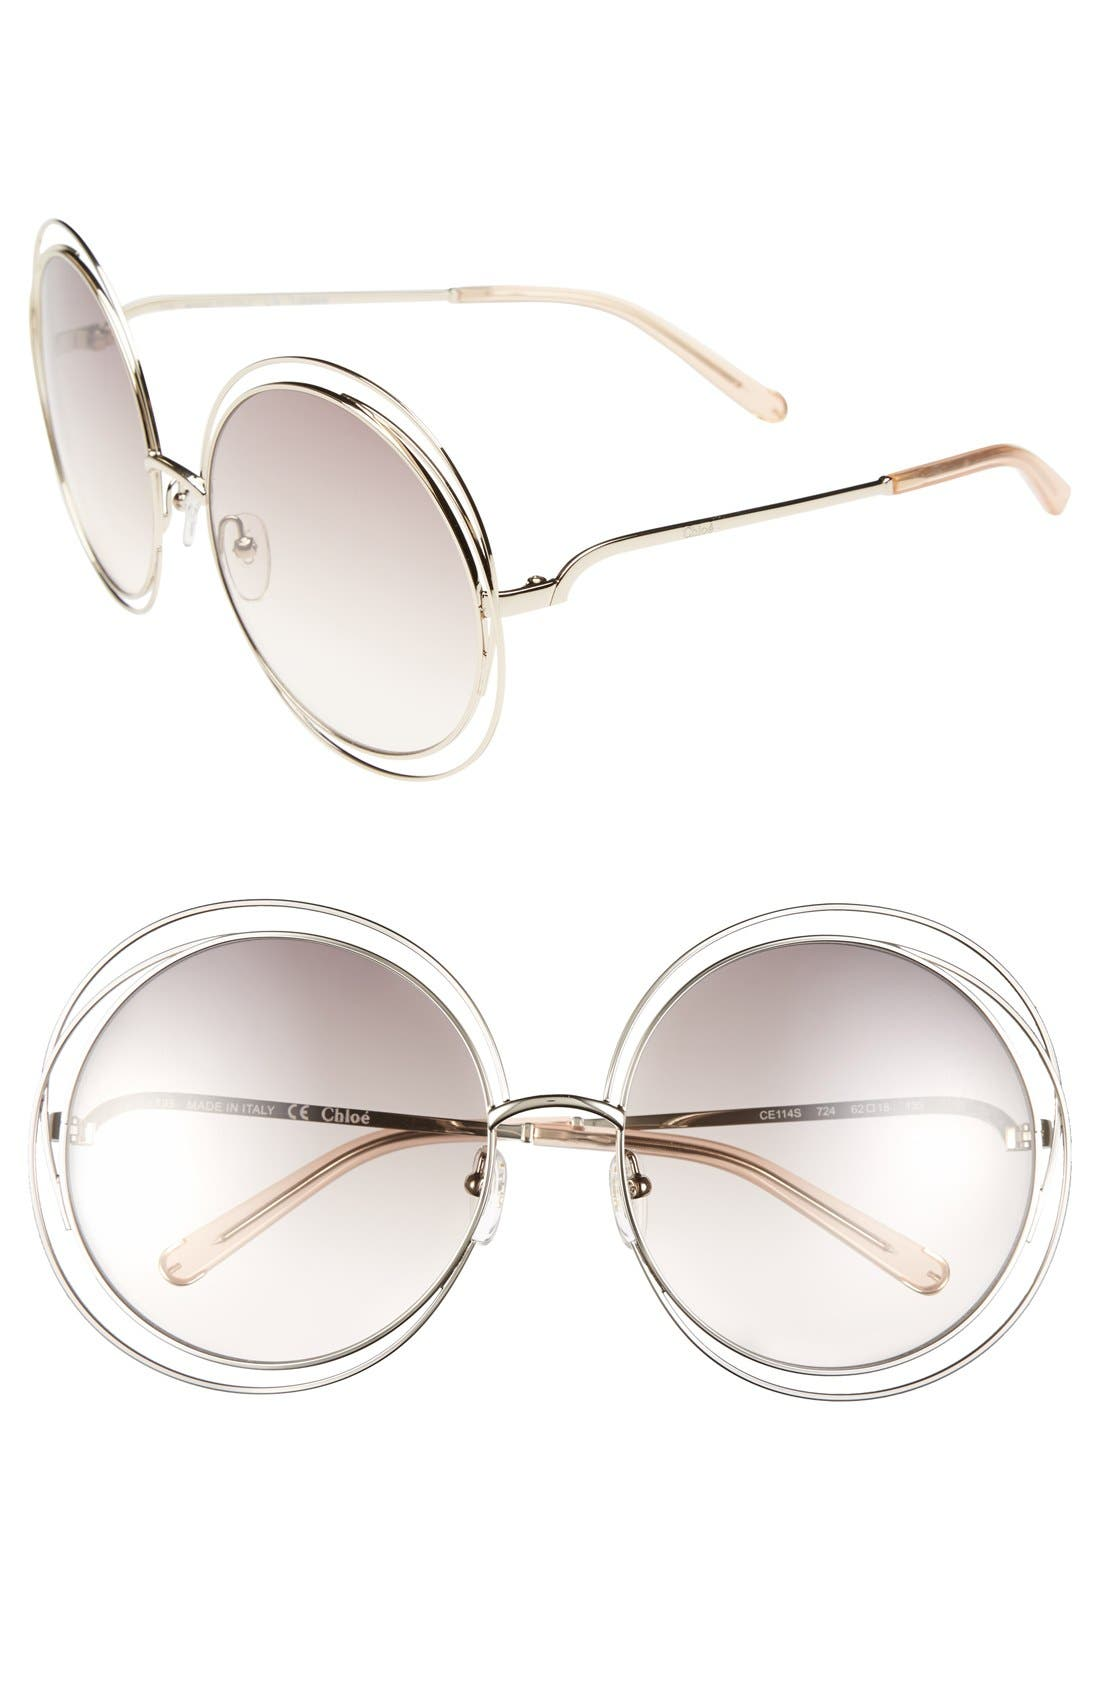 CHLOÉ 62mm Oversize Sunglasses, Main, color, GOLD/ TRANSPARENT PEACH